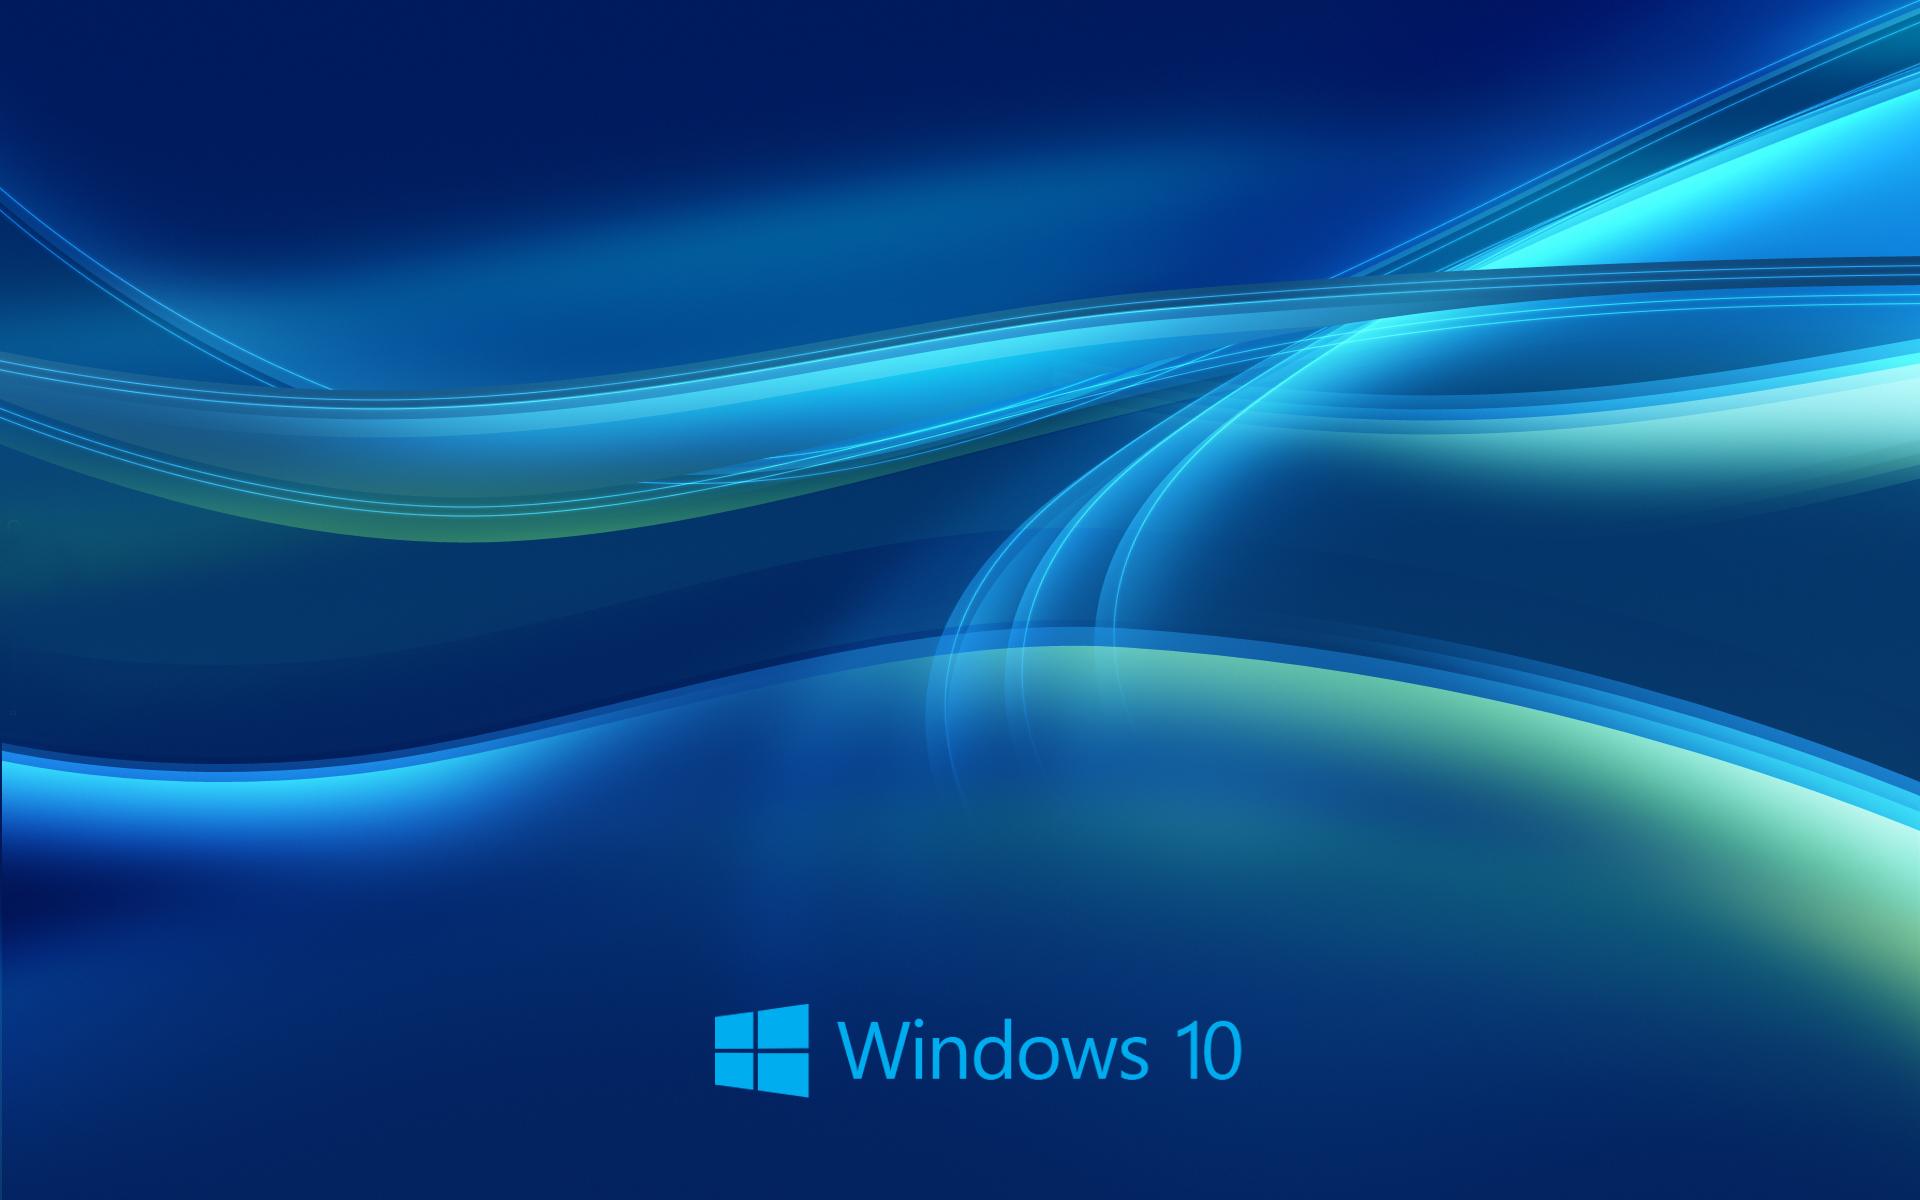 Windows 10 wallpaper hd 1080p wallpapersafari - Windows 10 wallpaper hd 1080p ...